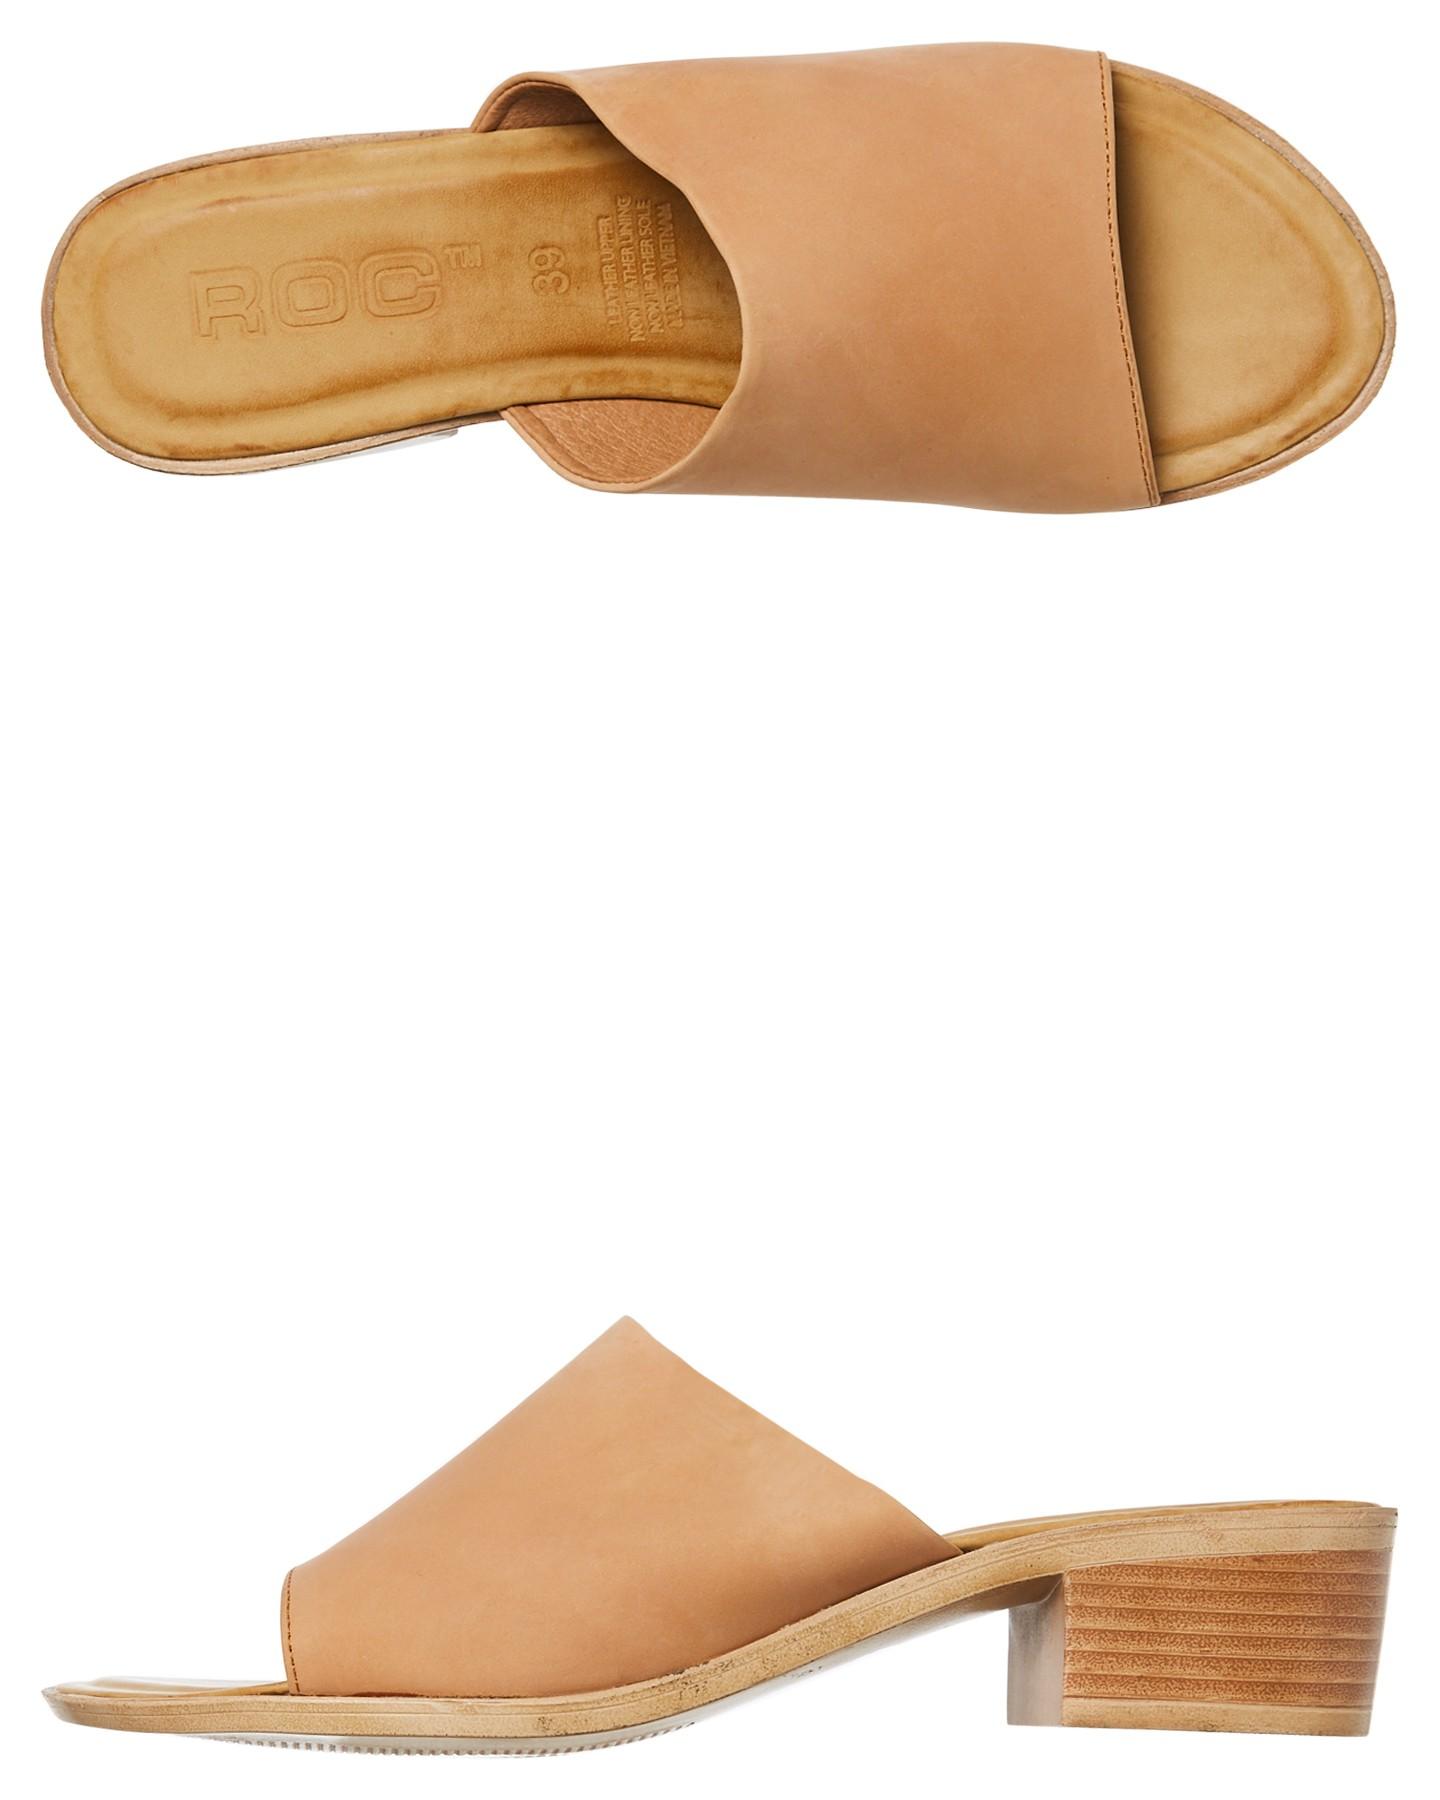 a5569b64b0d Tan Coloured Marni Slide Tan By ROC BOOTS AUSTRALIA | ShoeSales